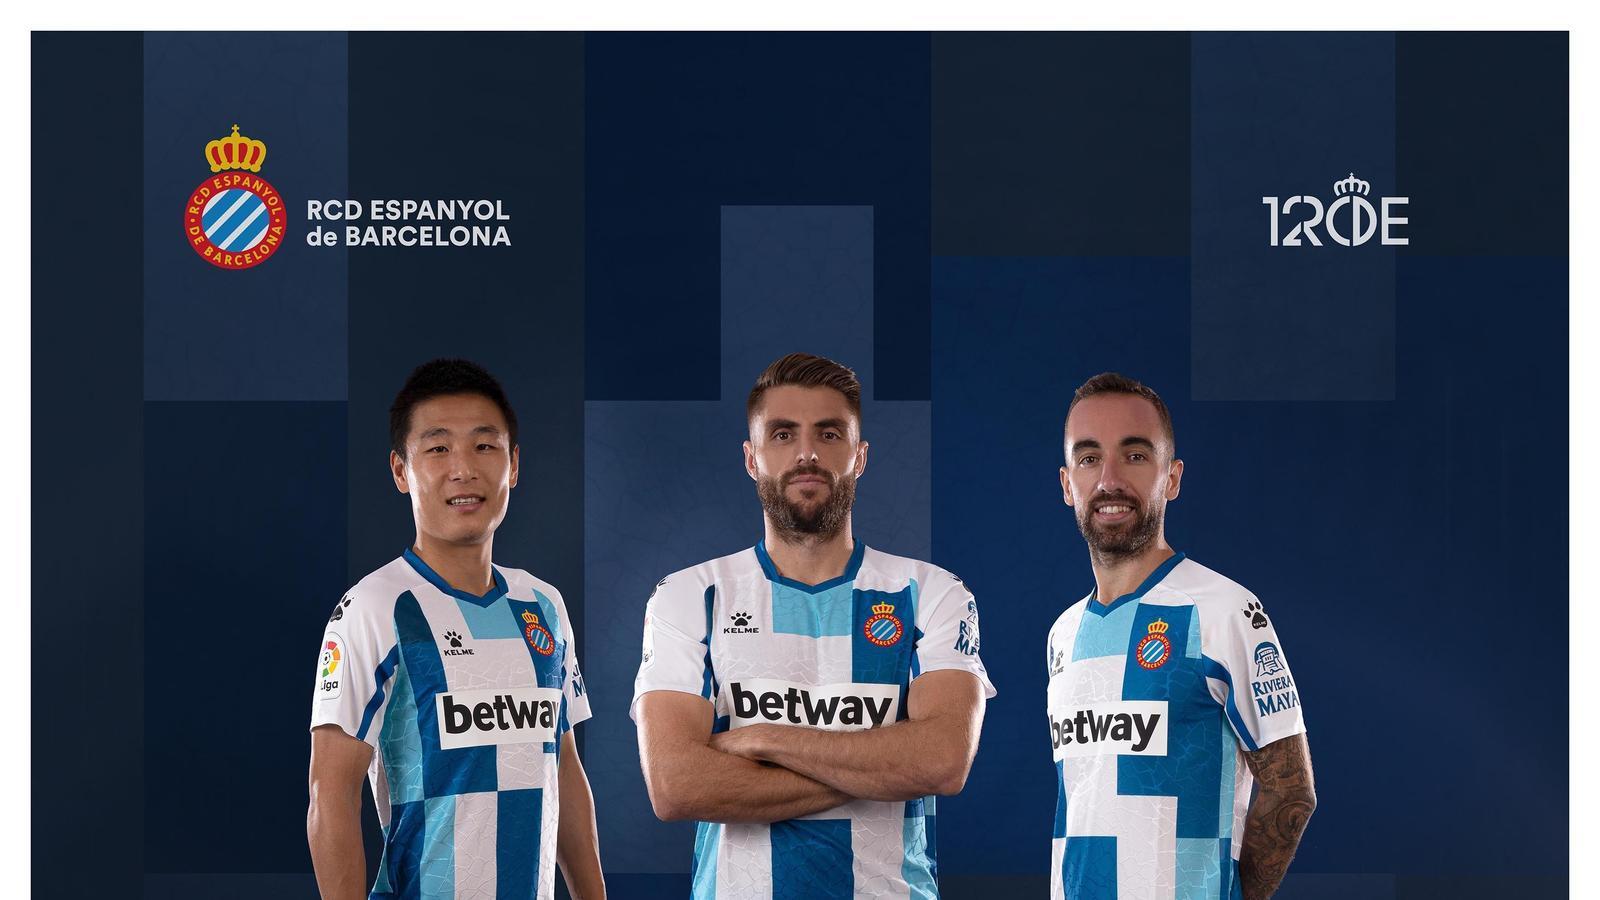 La samarreta commemorativa del 120è aniversari de l'Espanyol